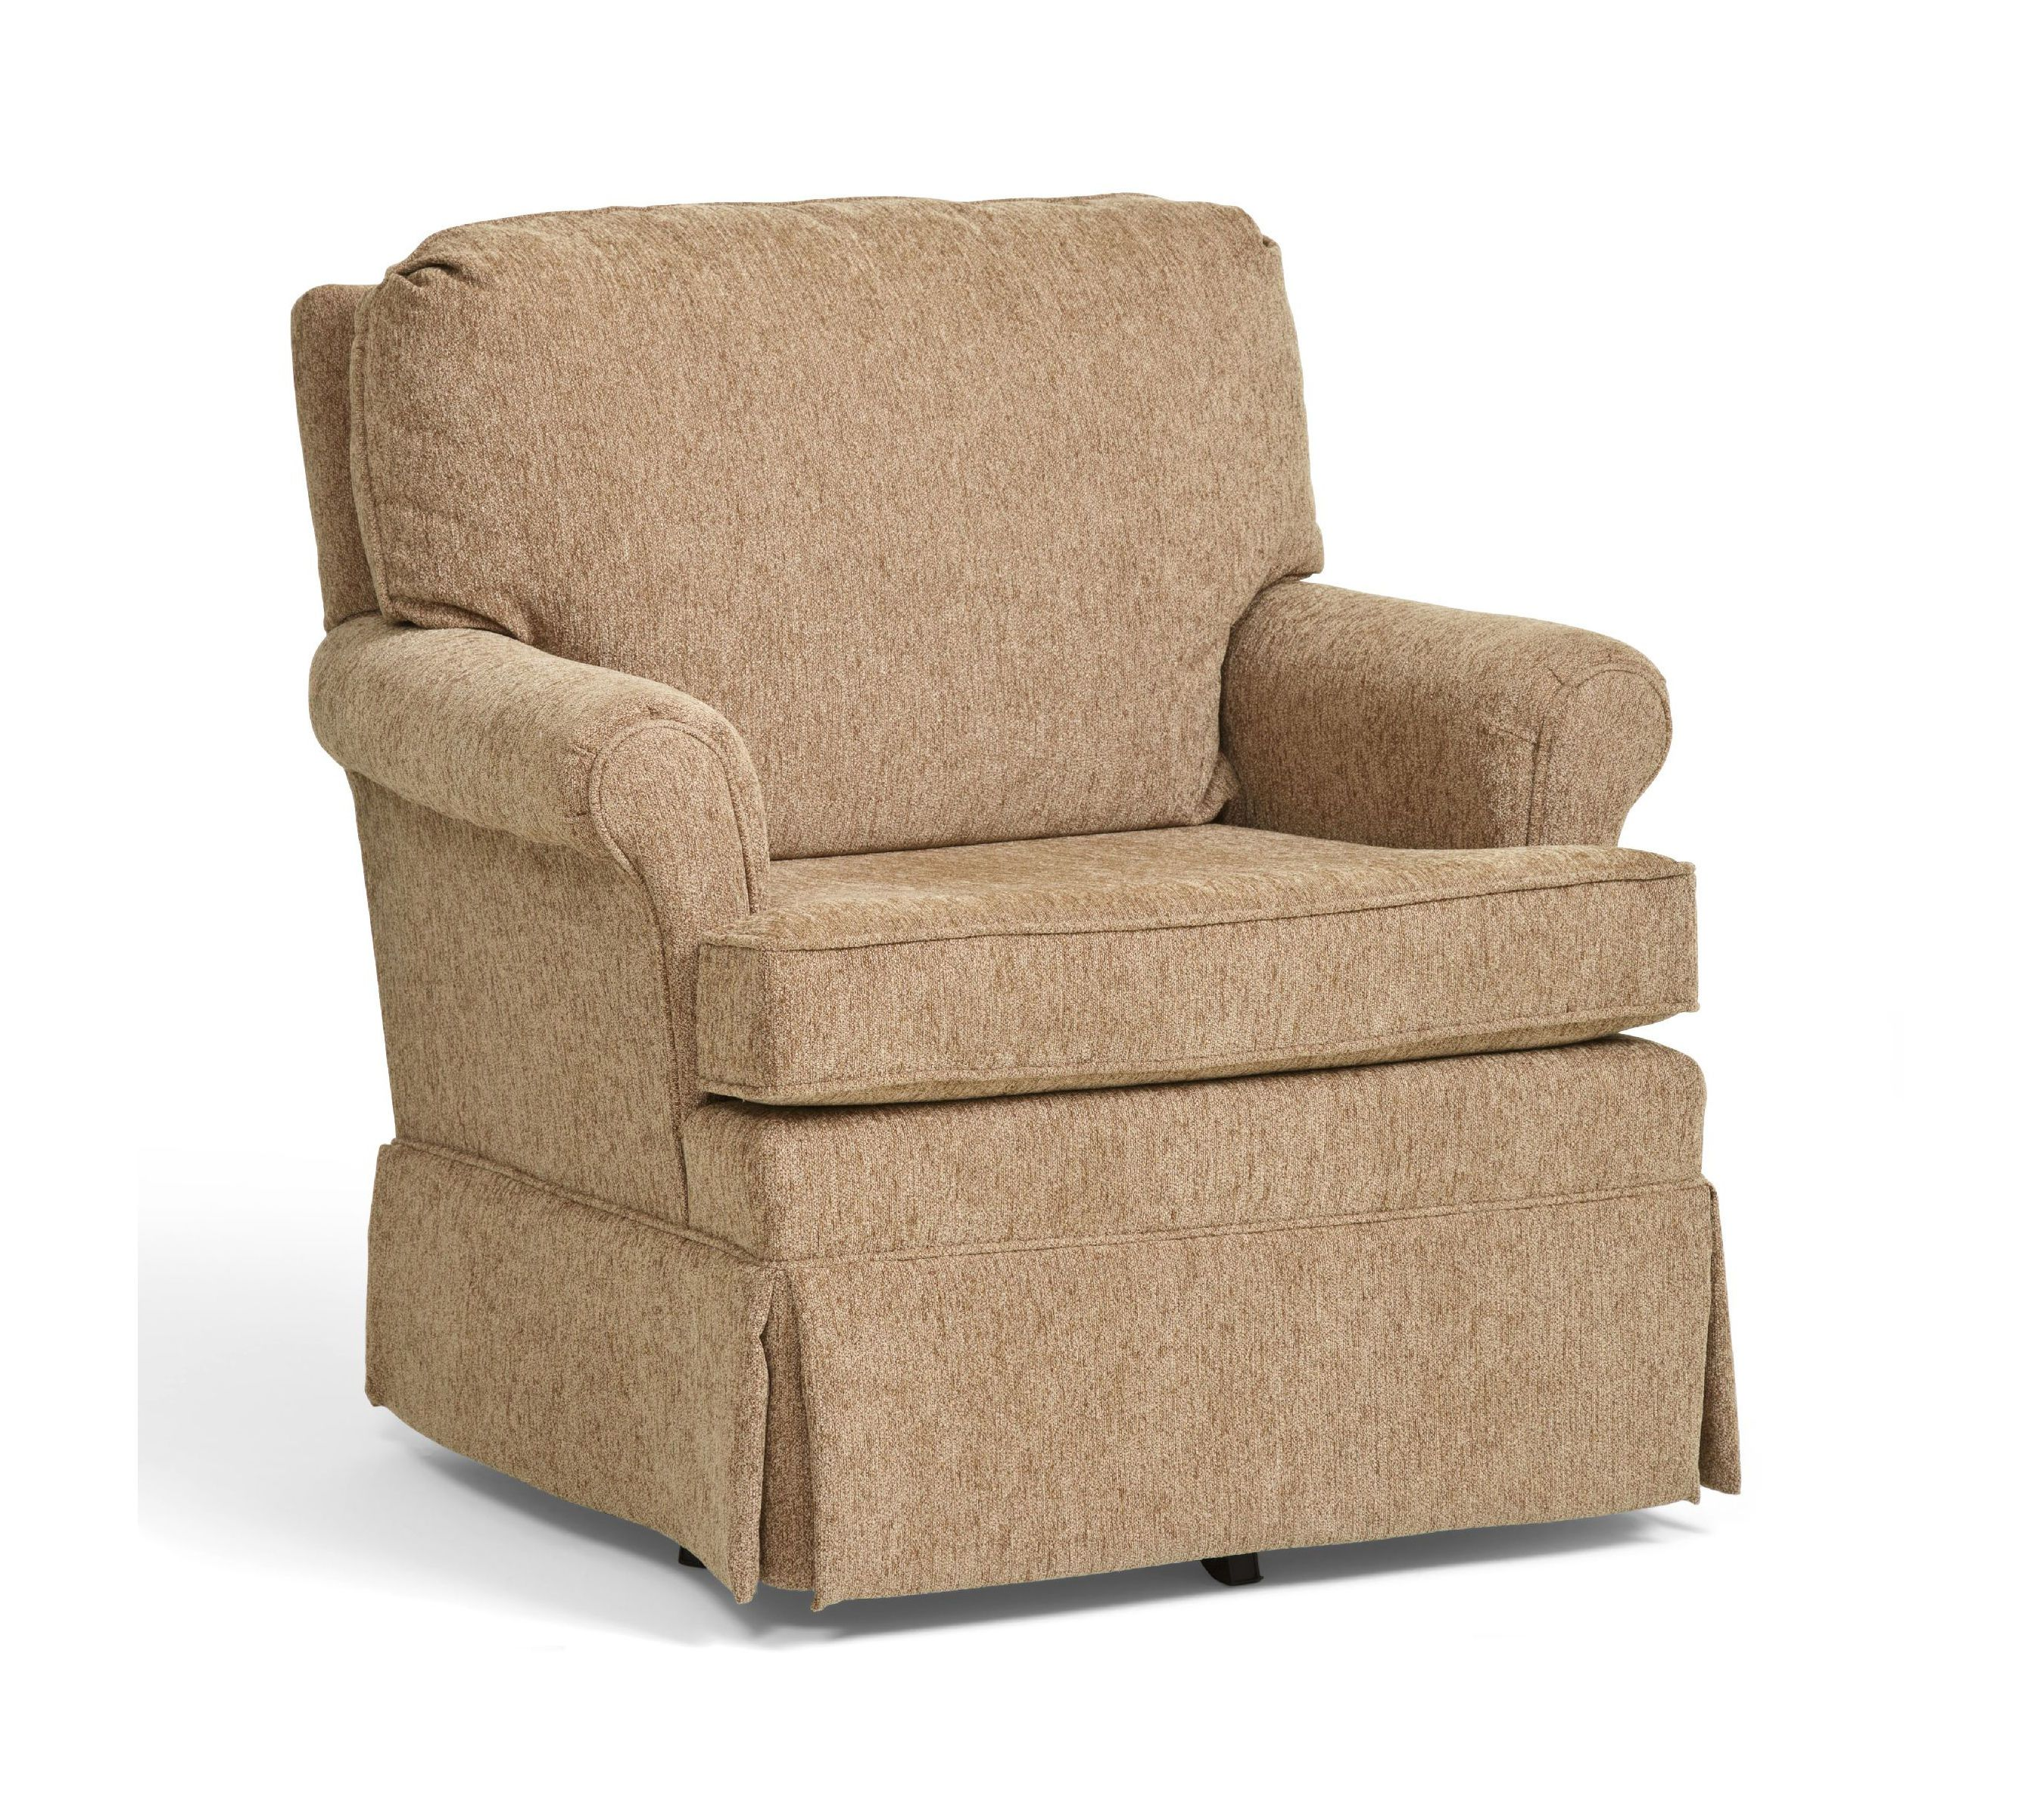 Best Bruno Camel Swivel Rocking Chair St 408585 Swivel 400 x 300